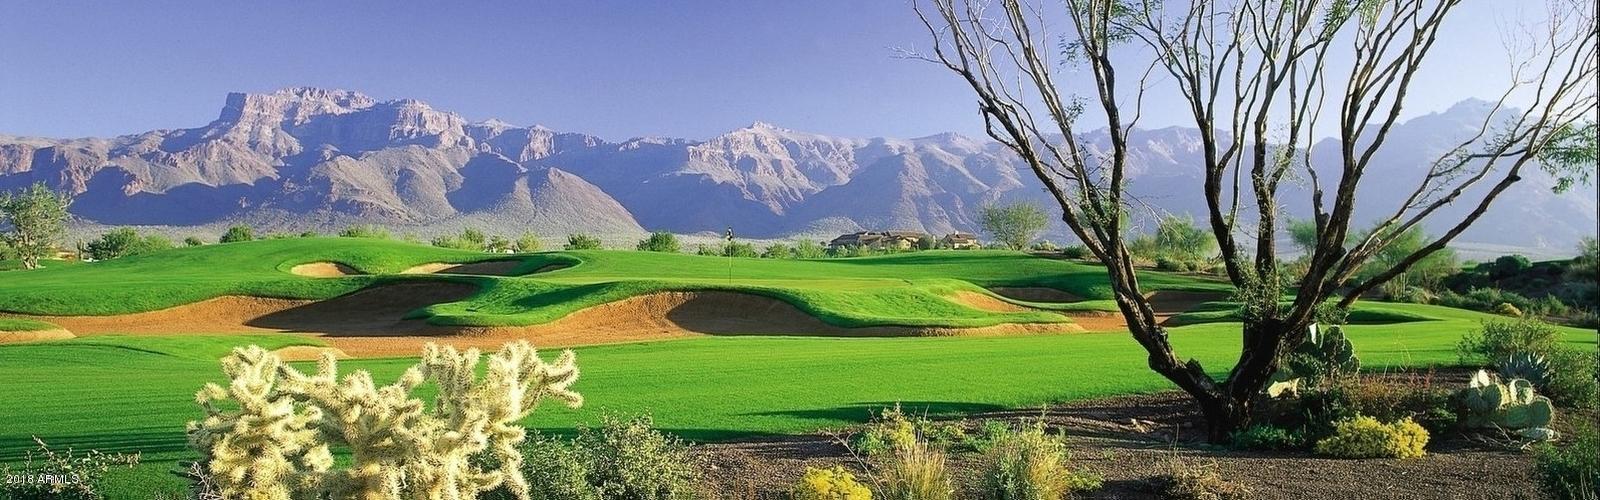 MLS 5755503 3372 S SYCAMORE VILLAGE Drive, Gold Canyon, AZ 85118 Gold Canyon AZ Cul-De-Sac